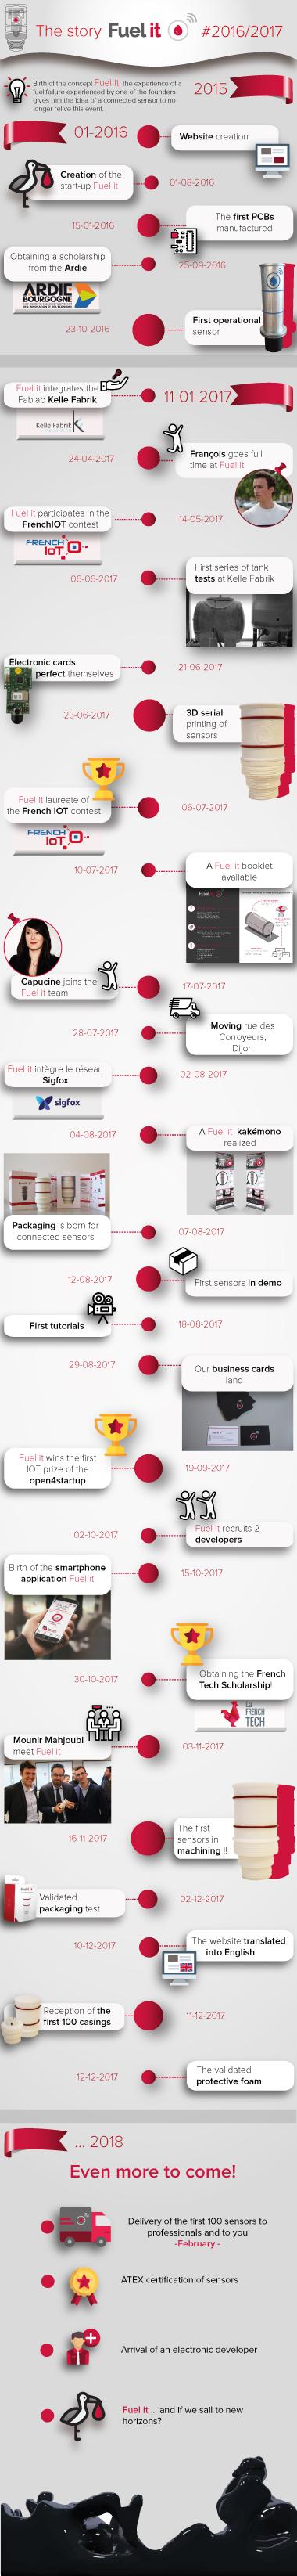 Fuel-it-history-2016-2017